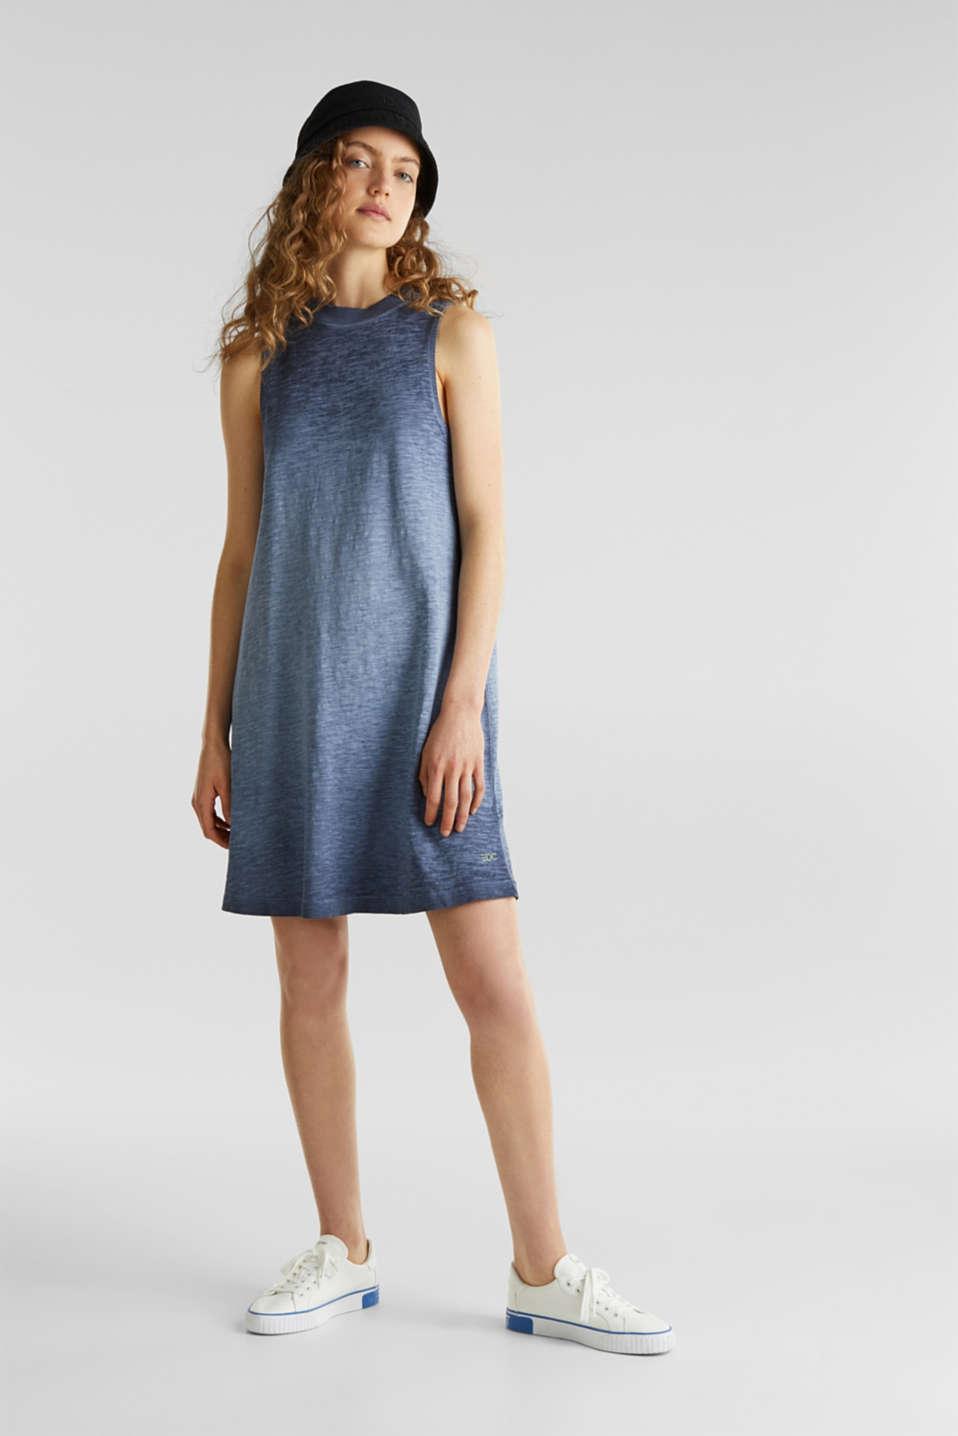 Cotton jersey dress, NAVY, detail image number 1